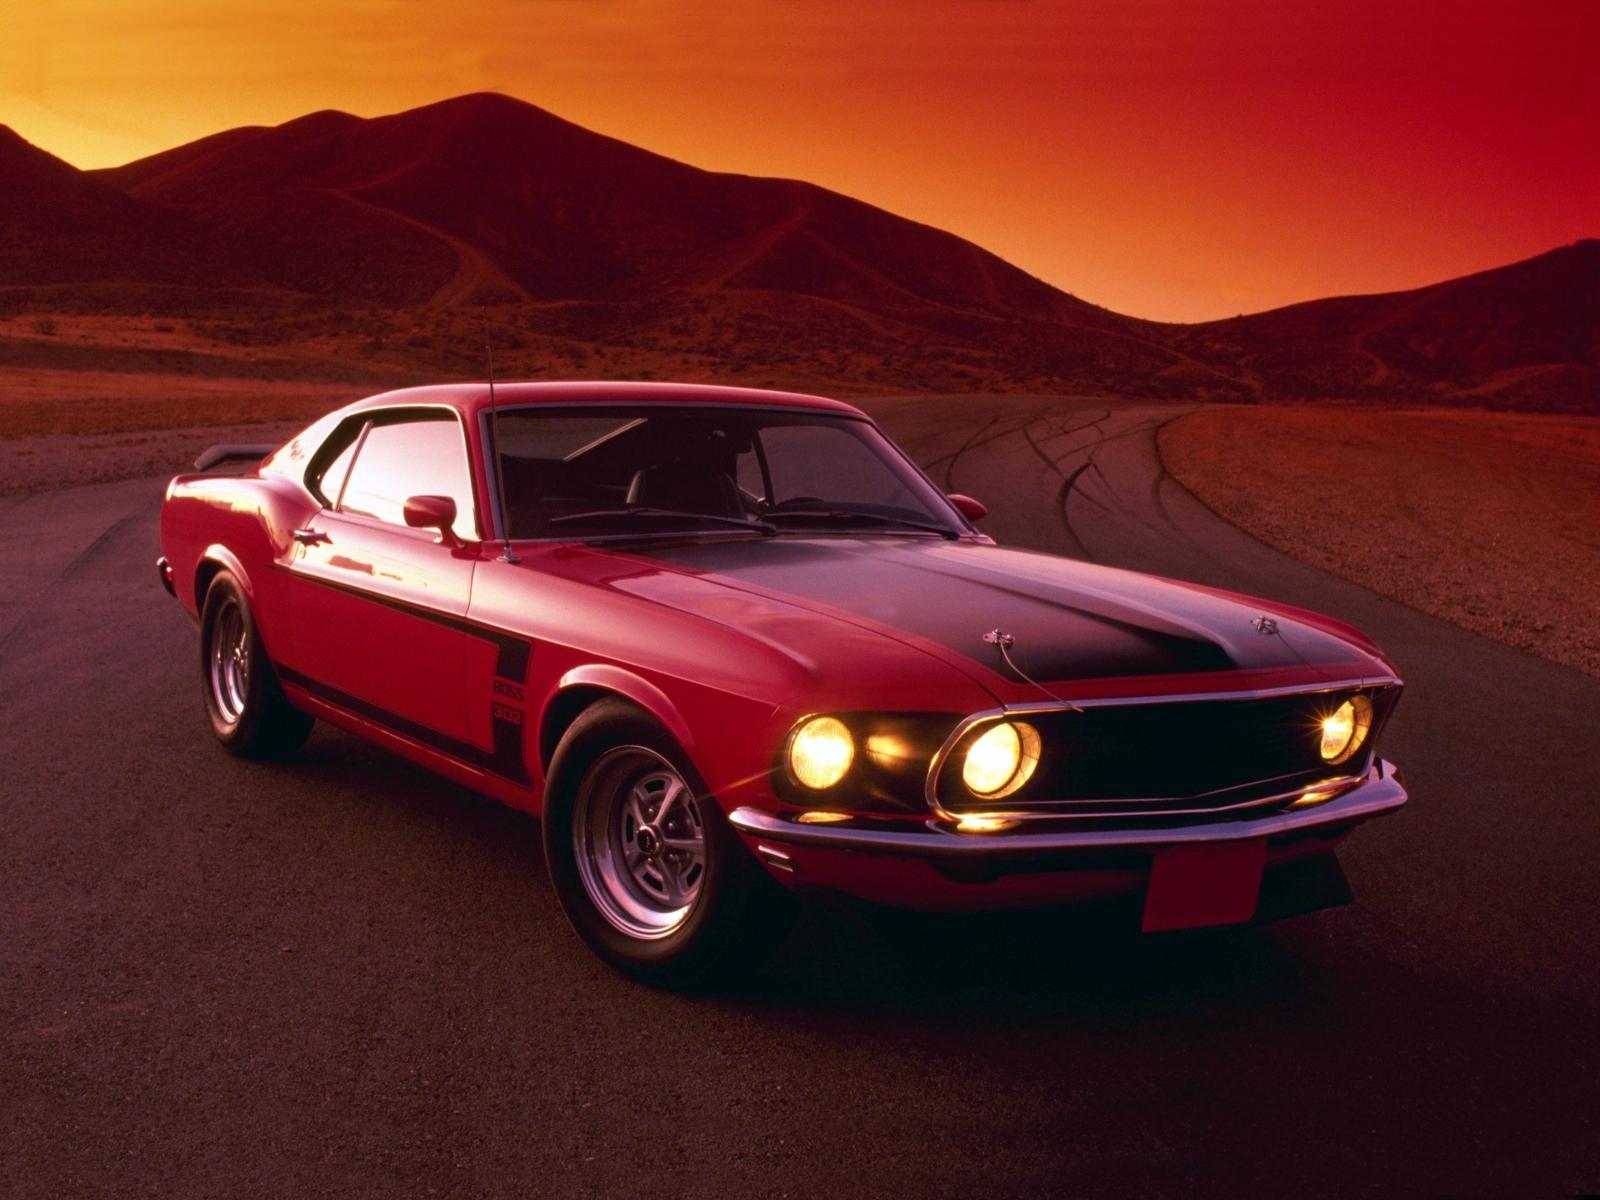 1969 ford mustang boss 302 muscle classic g wallpaper 1600x1200 114836 wallpaperup